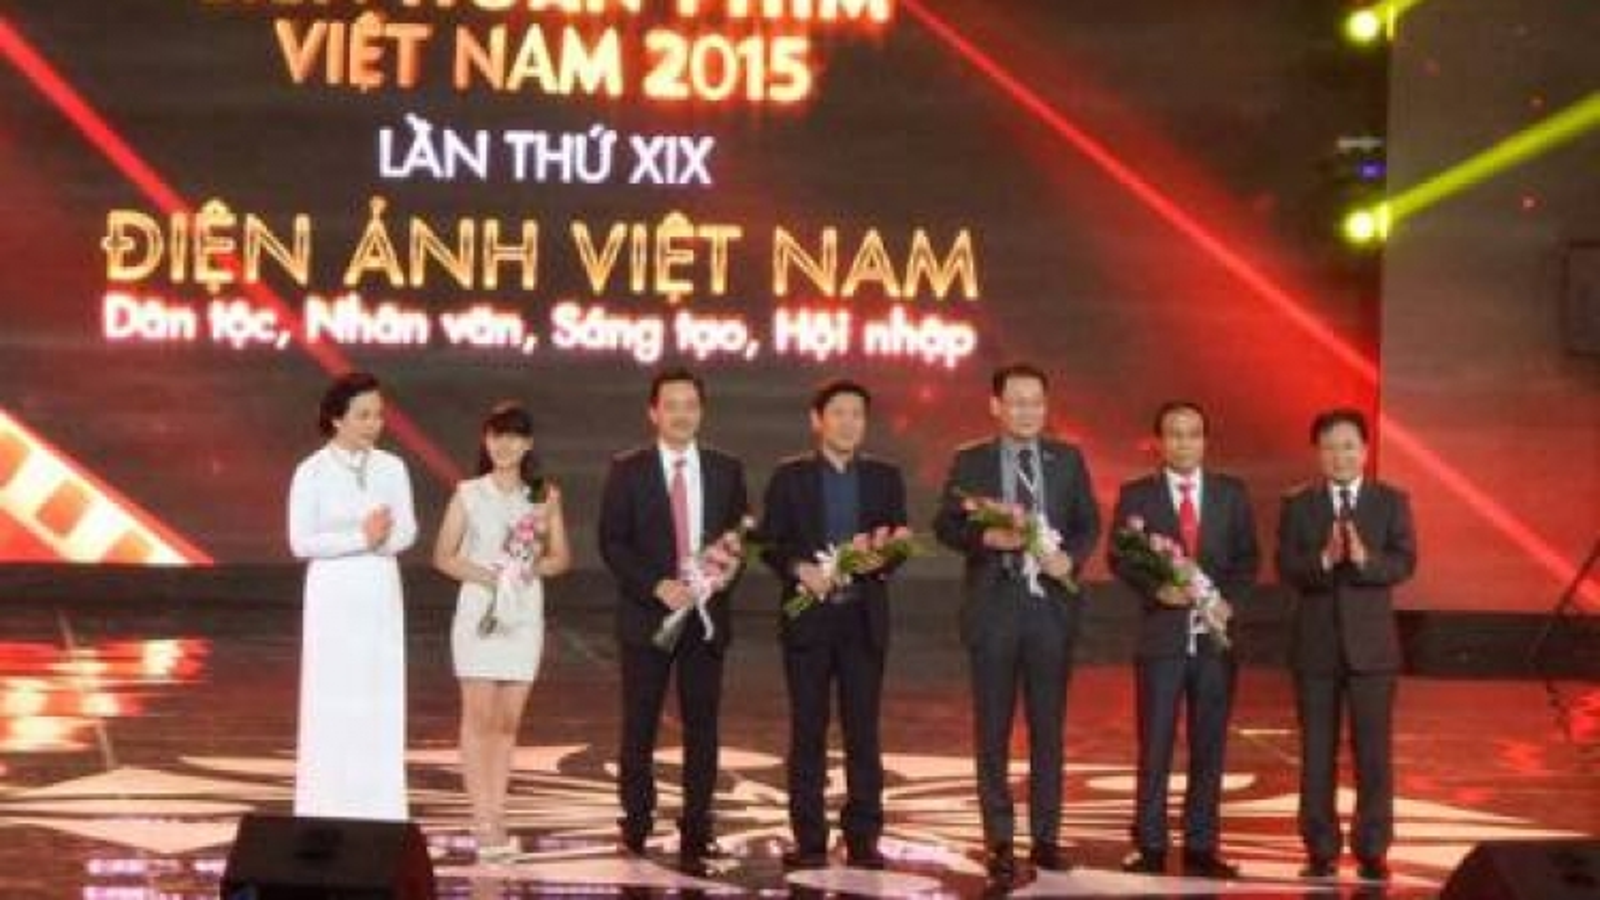 20th Vietnam Film Festival to kick off in Danang